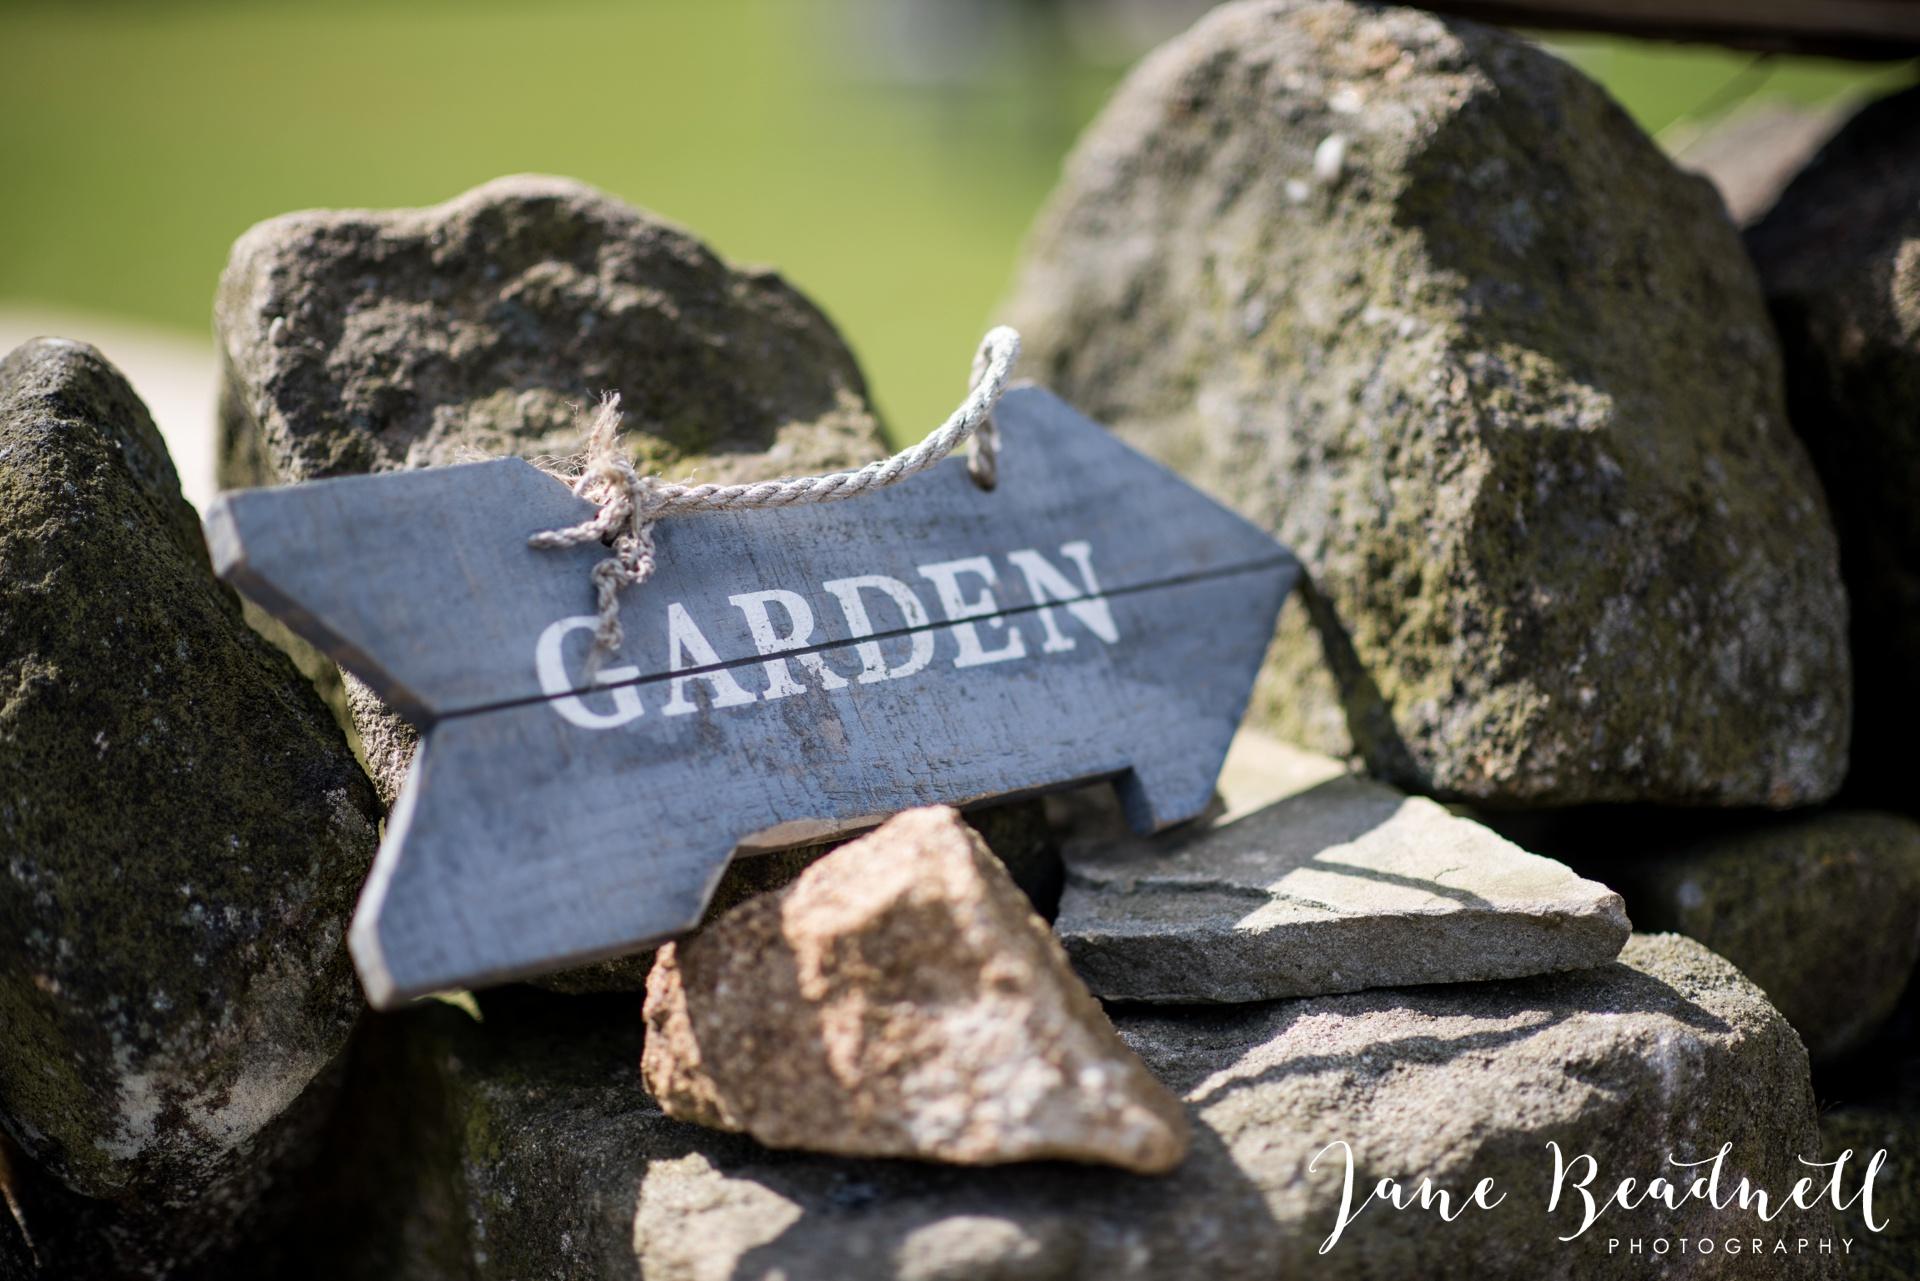 Jane Beadnell fine art wedding photographer The Cheerful Chilli Barn Otley_0007